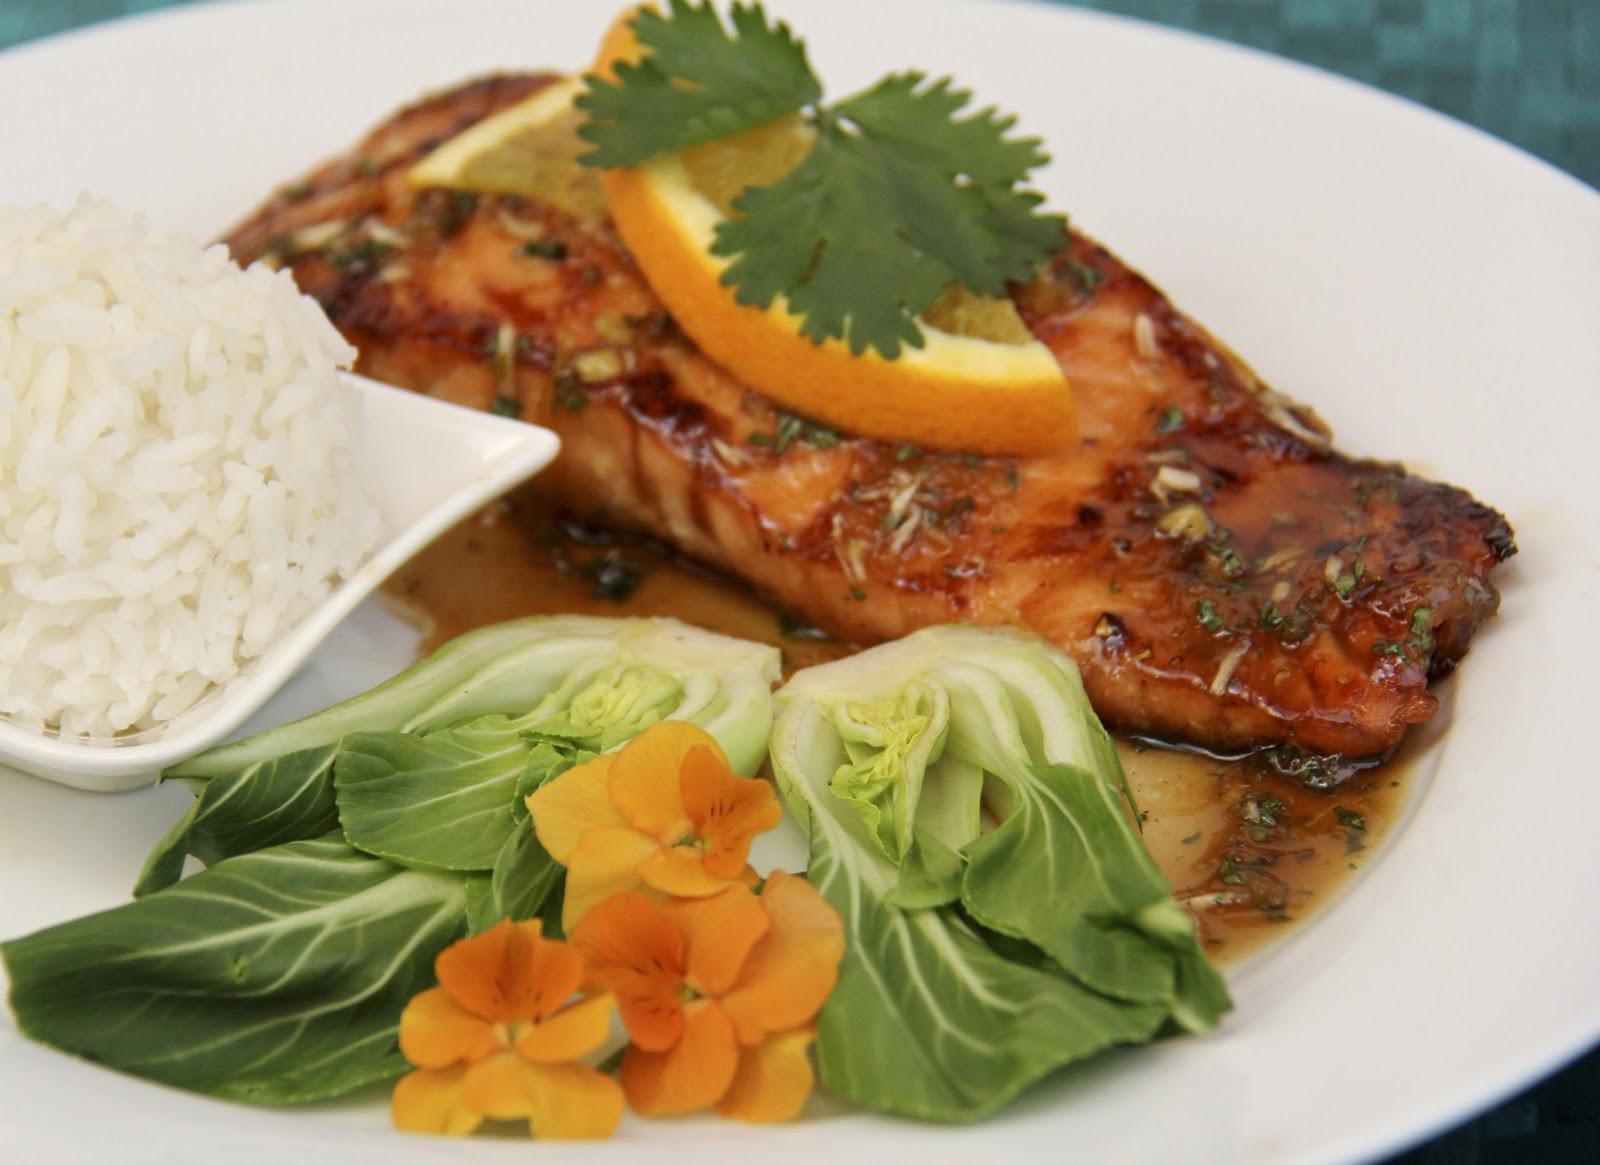 ... Farine: Sugar-Seared Salmon w/ Sweet & Spicy Orange-Coconut Sauce